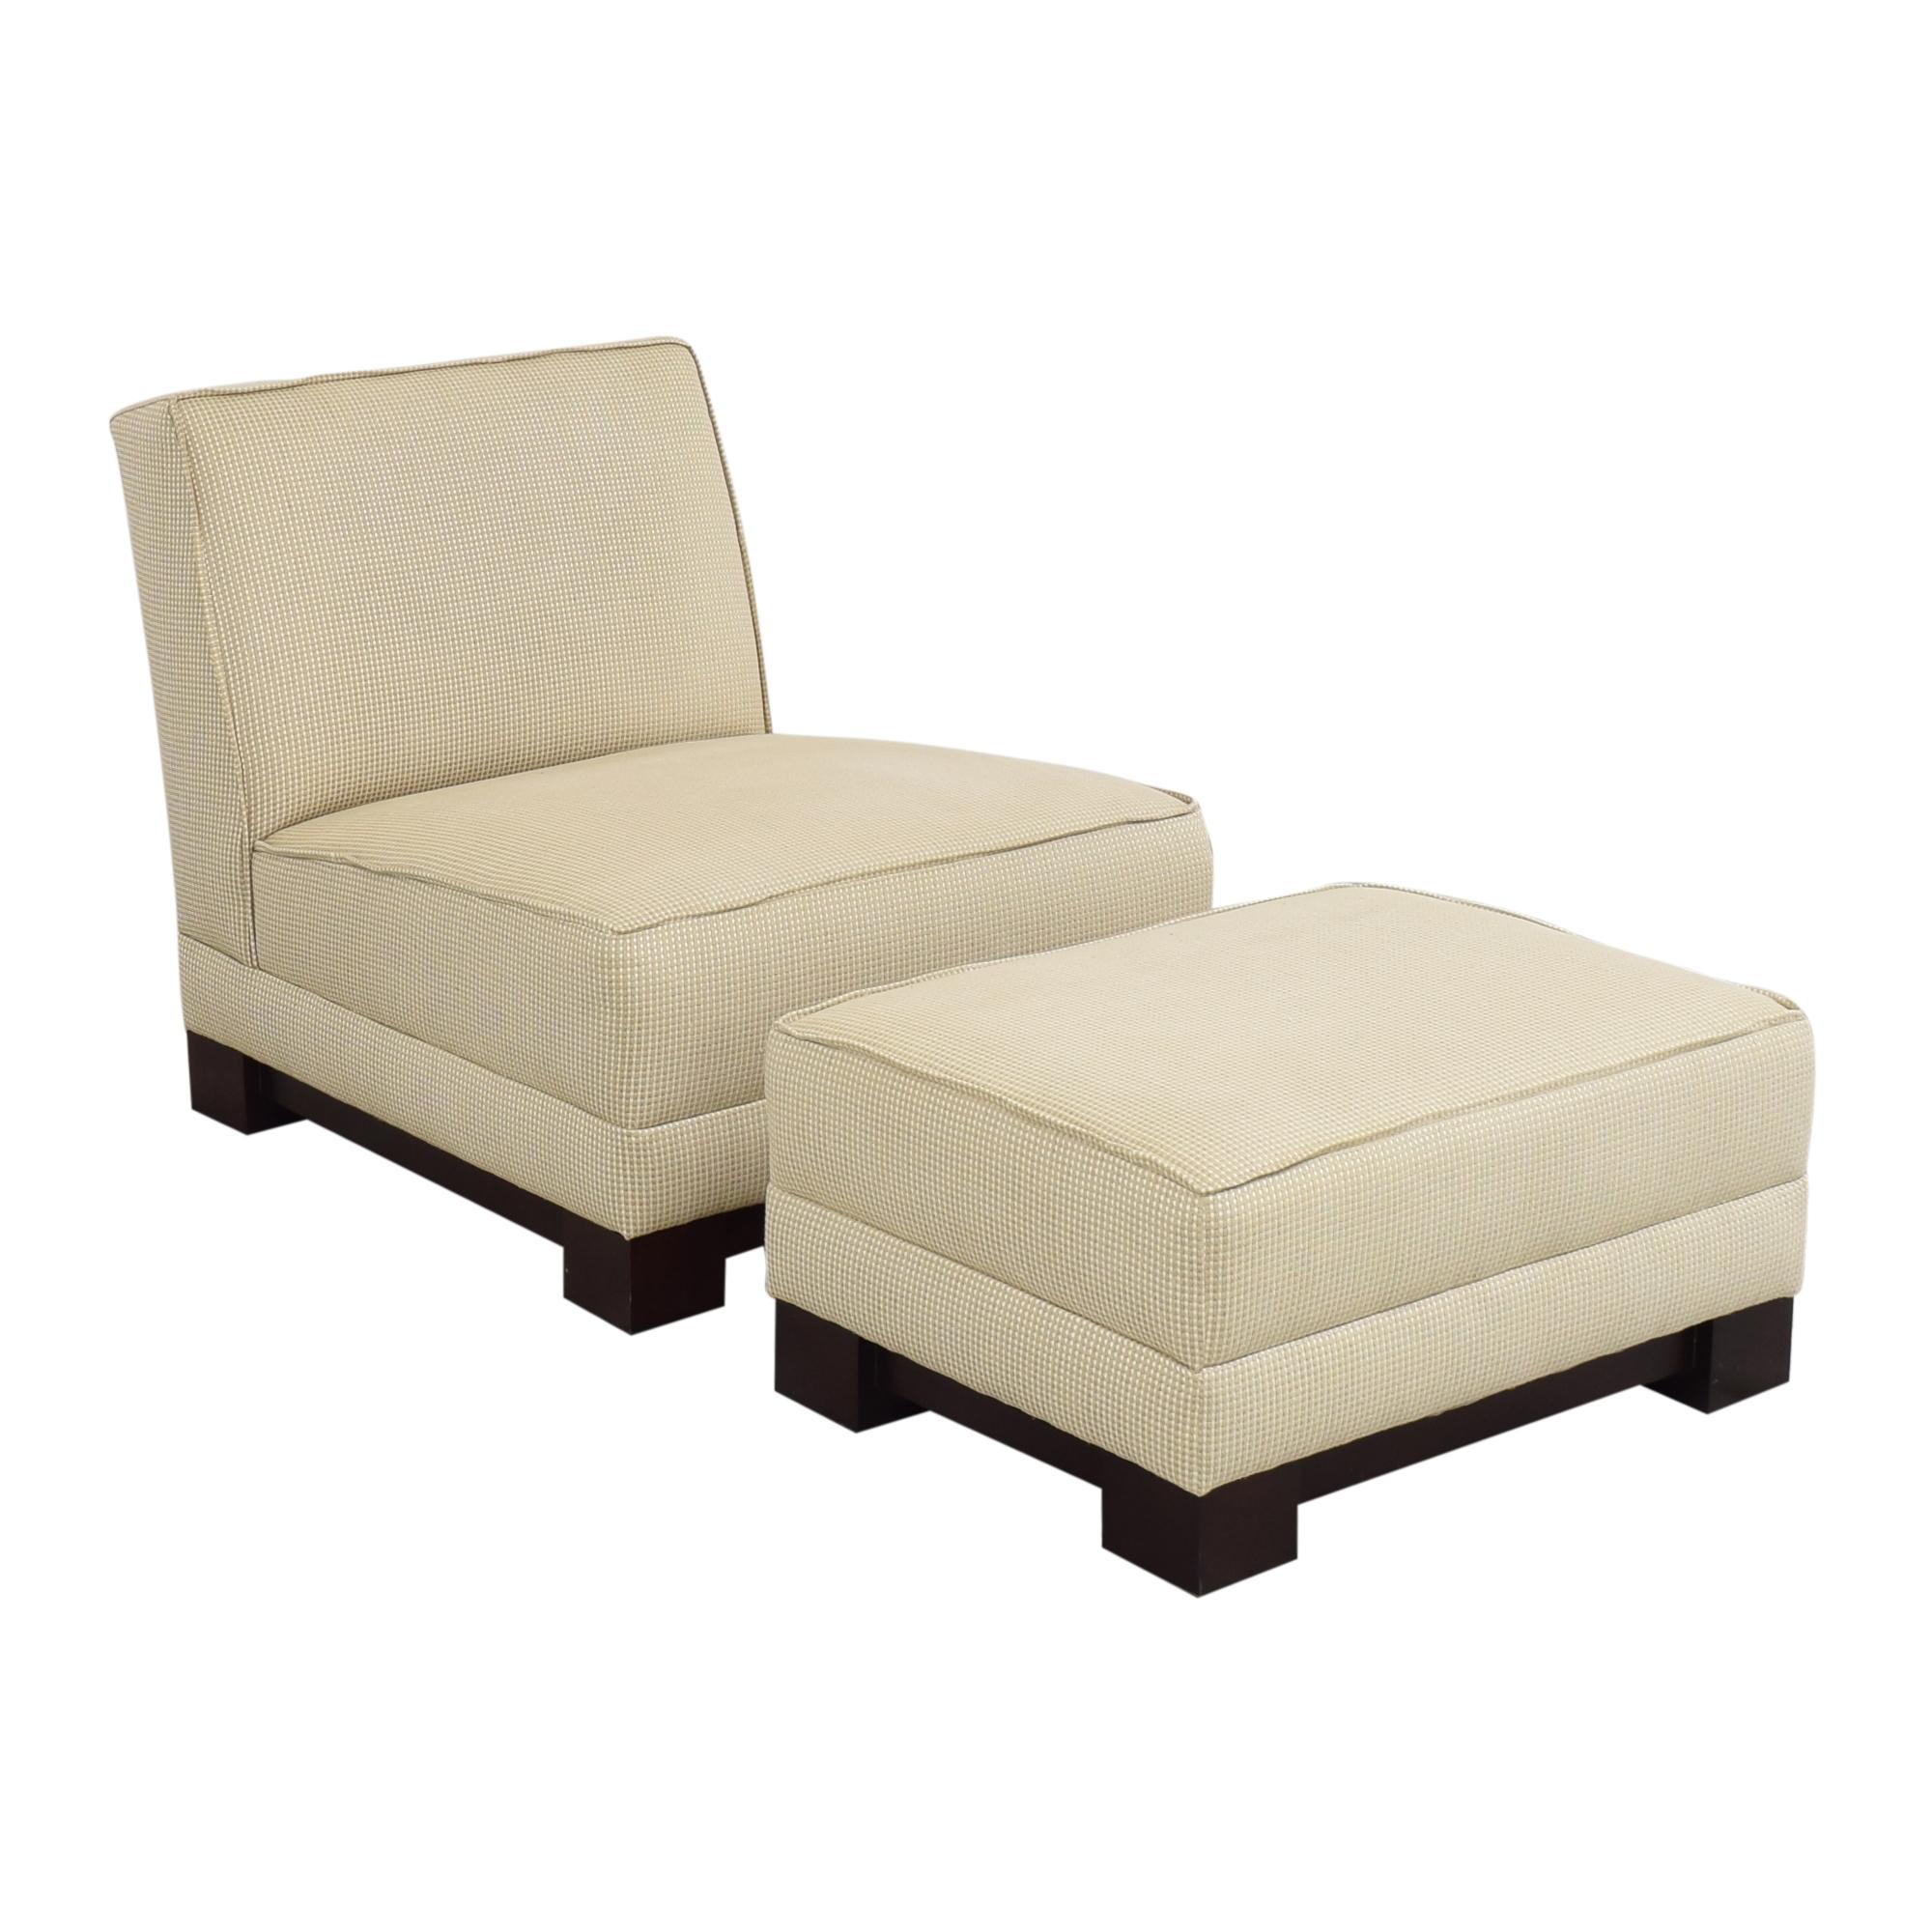 Ralph Lauren Home Ralph Lauren Home Hasley Slipper Chair with Ottoman on sale